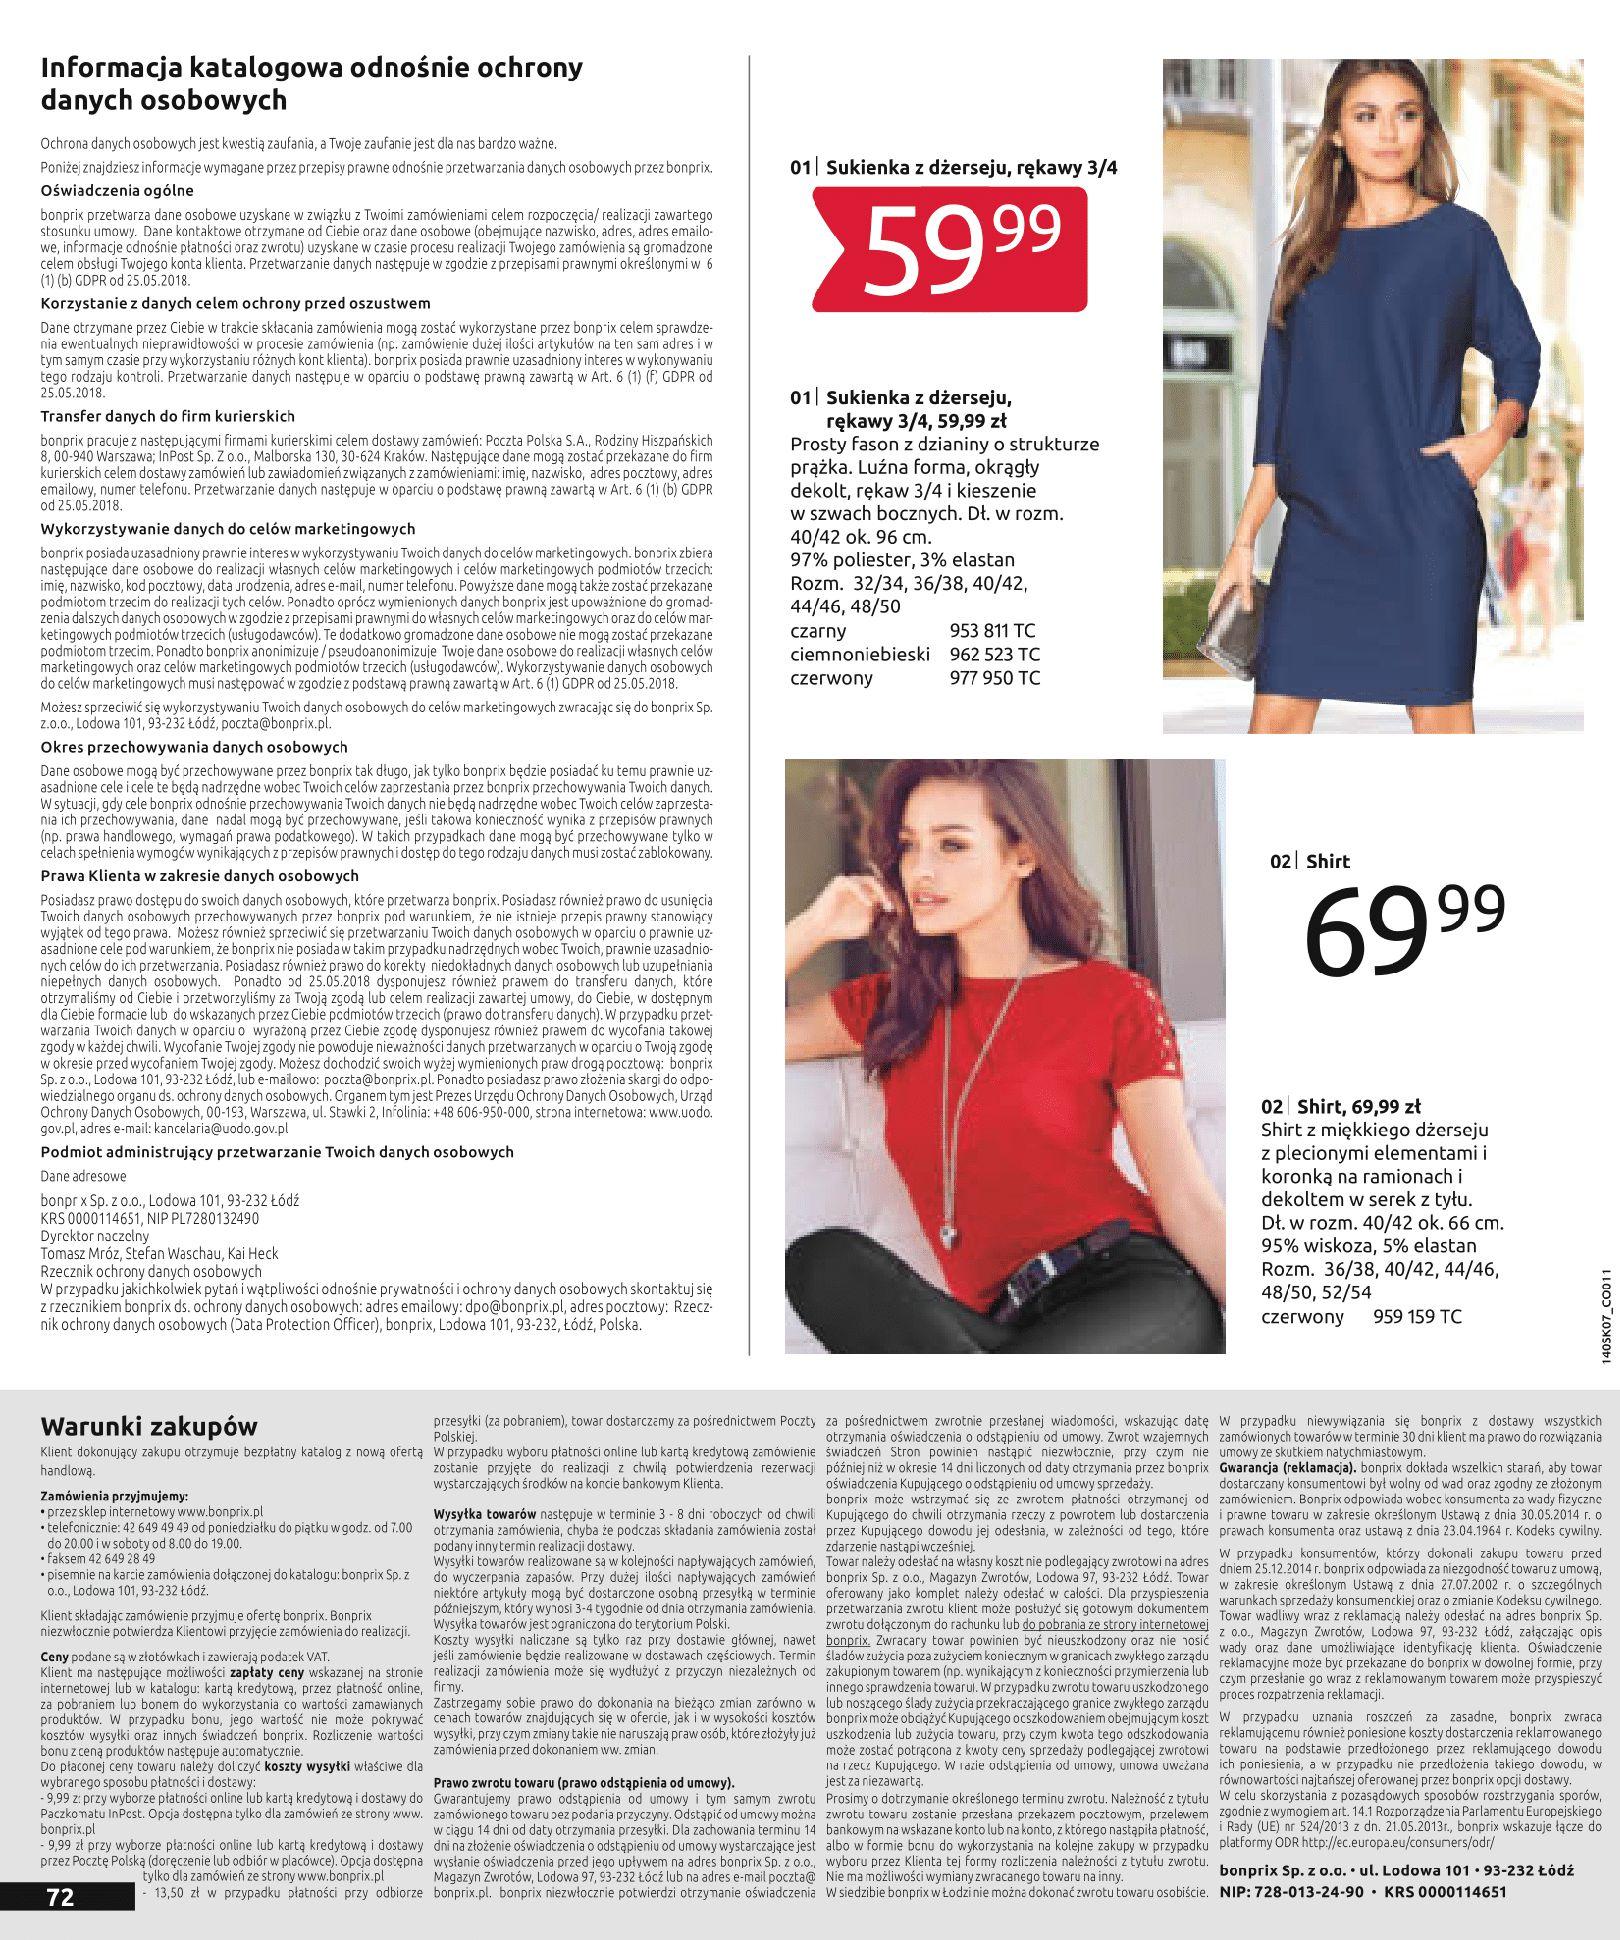 Gazetka Bonprix - Letnie trendy-02.07.2019-15.01.2020-page-74